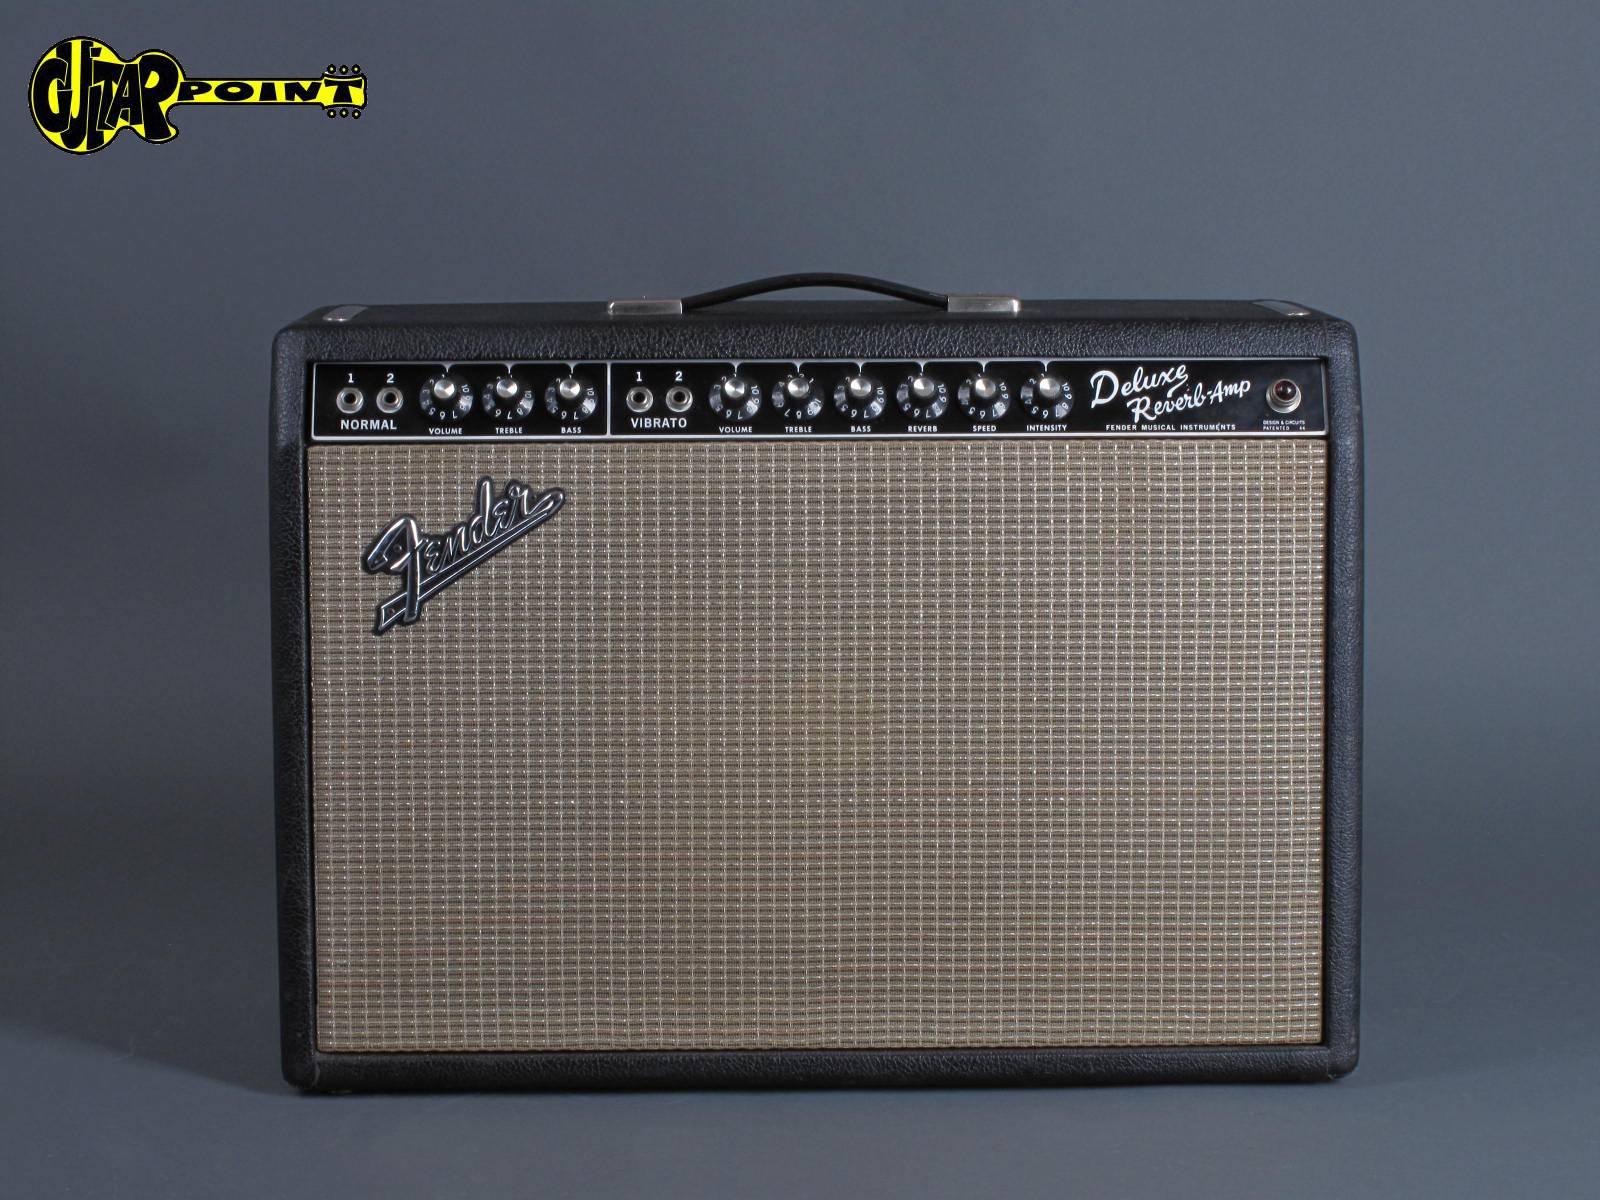 1966 Fender Deluxe Reverb Amp - Blackface - Clean !!!